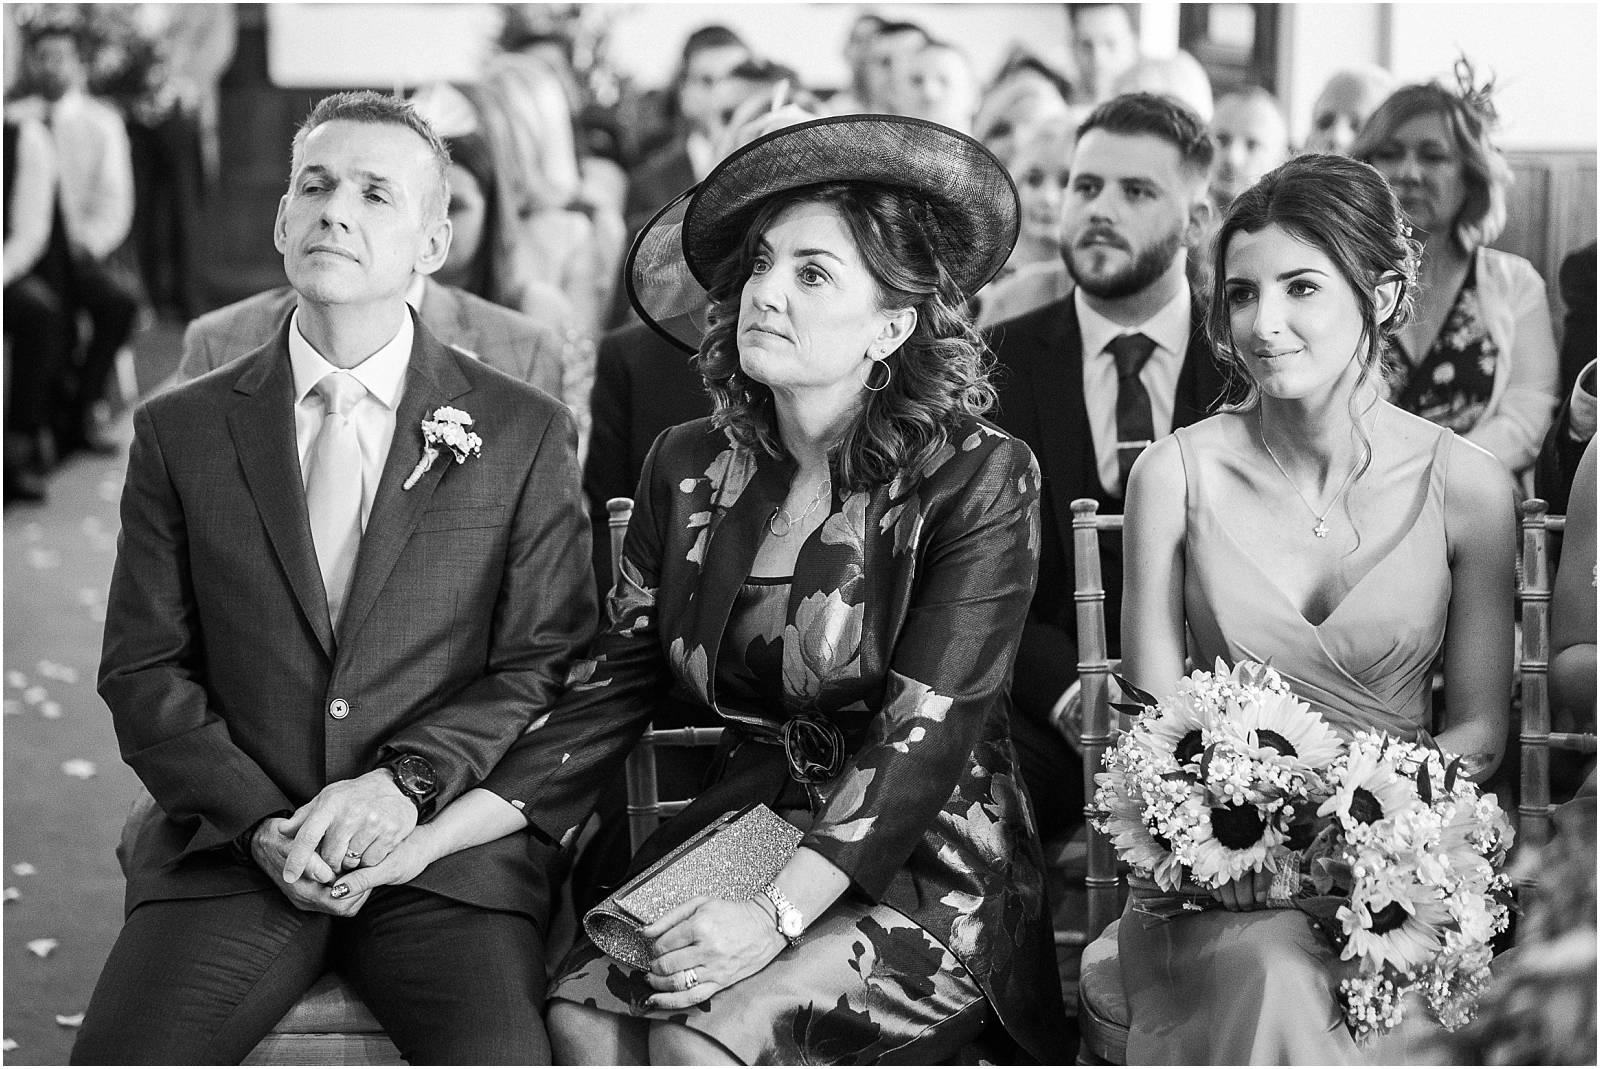 watching the wedding cermony